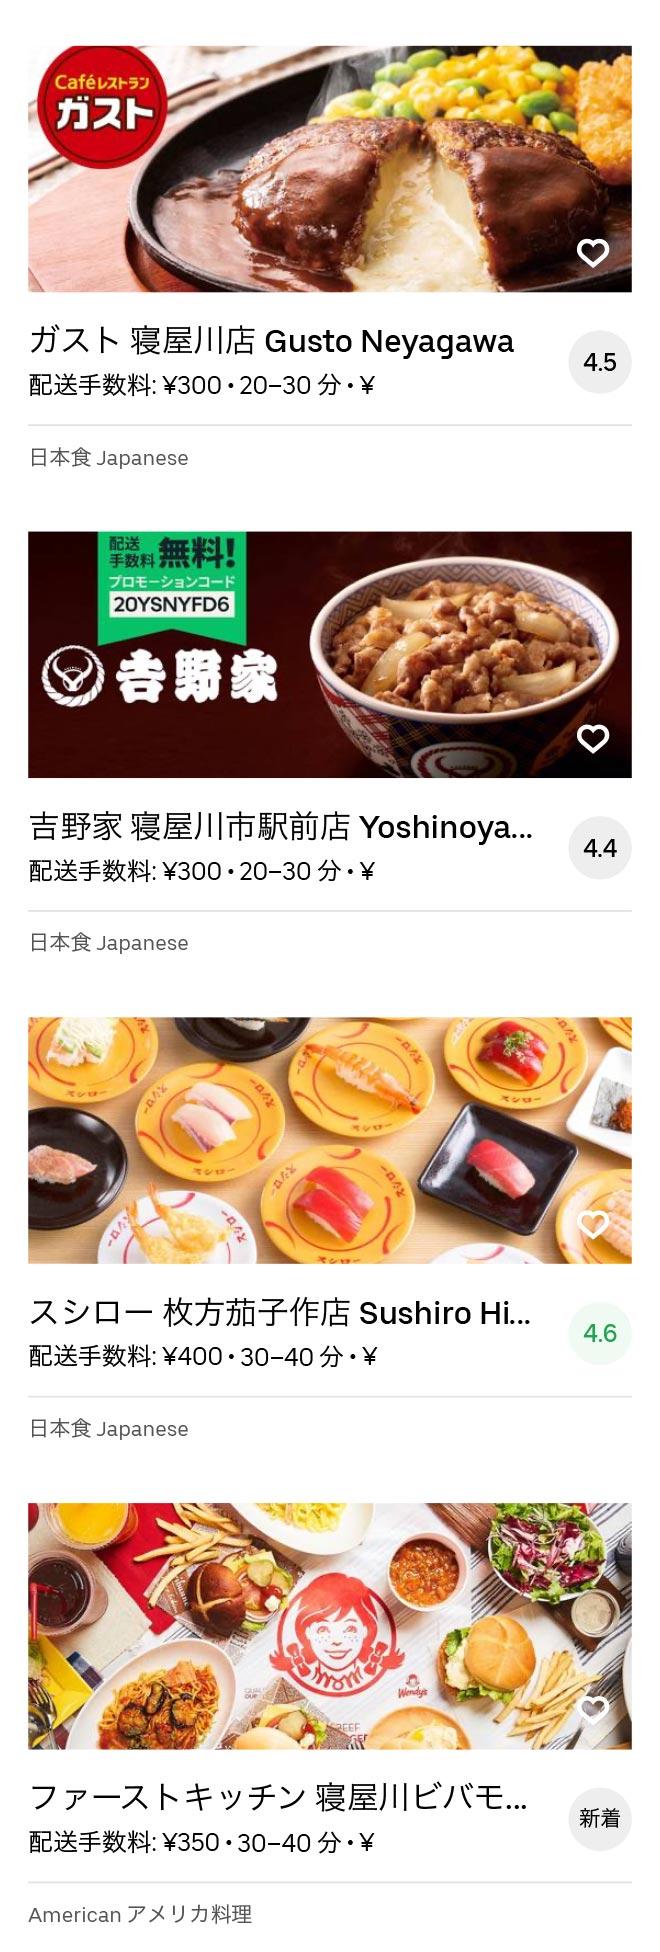 Neyagawa kourien menu 2006 05